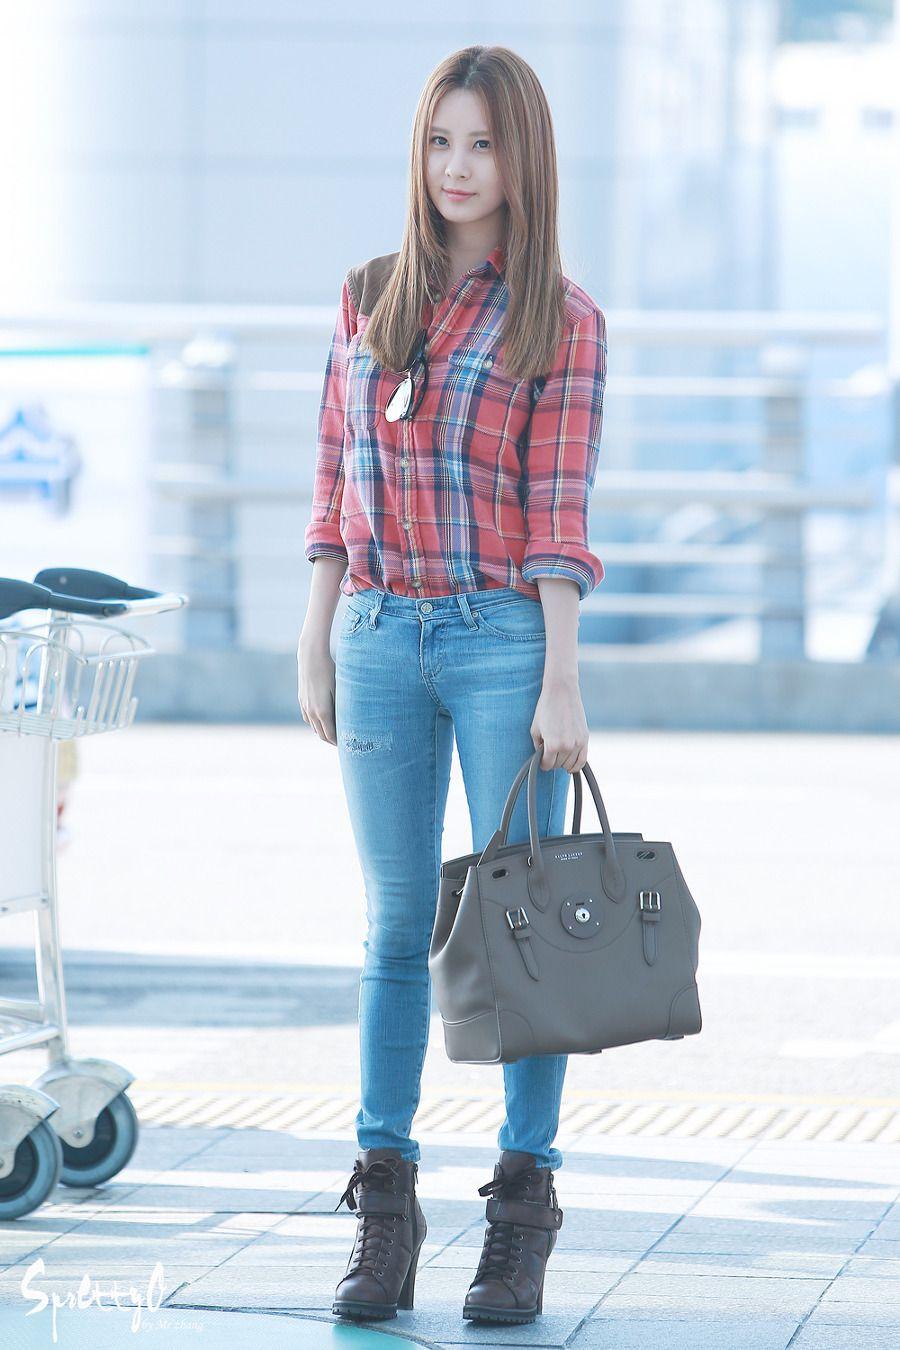 snsd seohyun airport fashion 140906 2014 seohyun